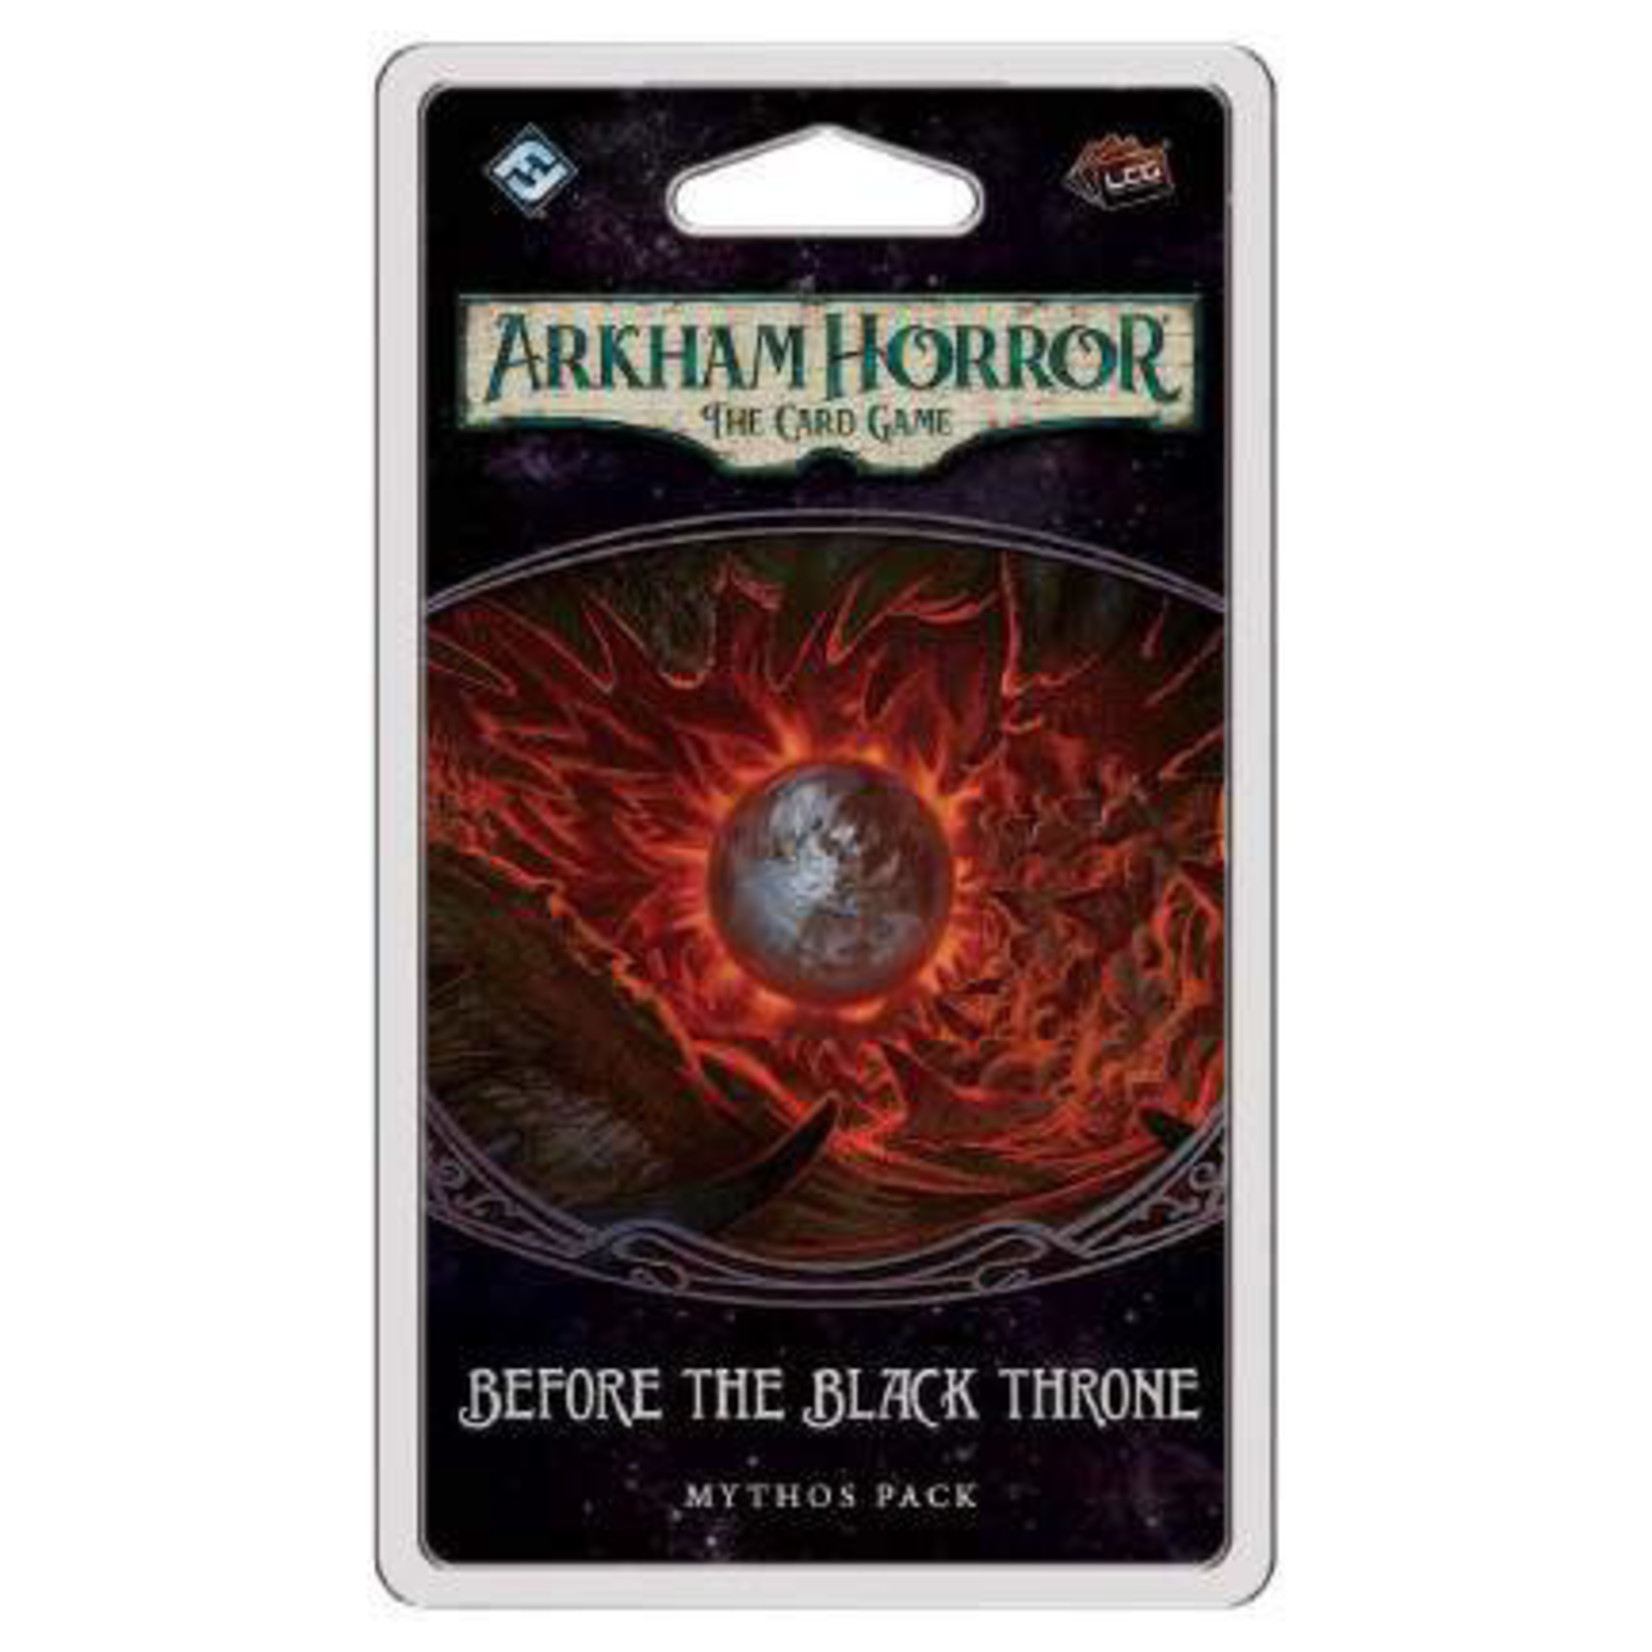 Fantasy Flight Games Arkham Horror The Card Game: Before the Black Throne Mythos Pack